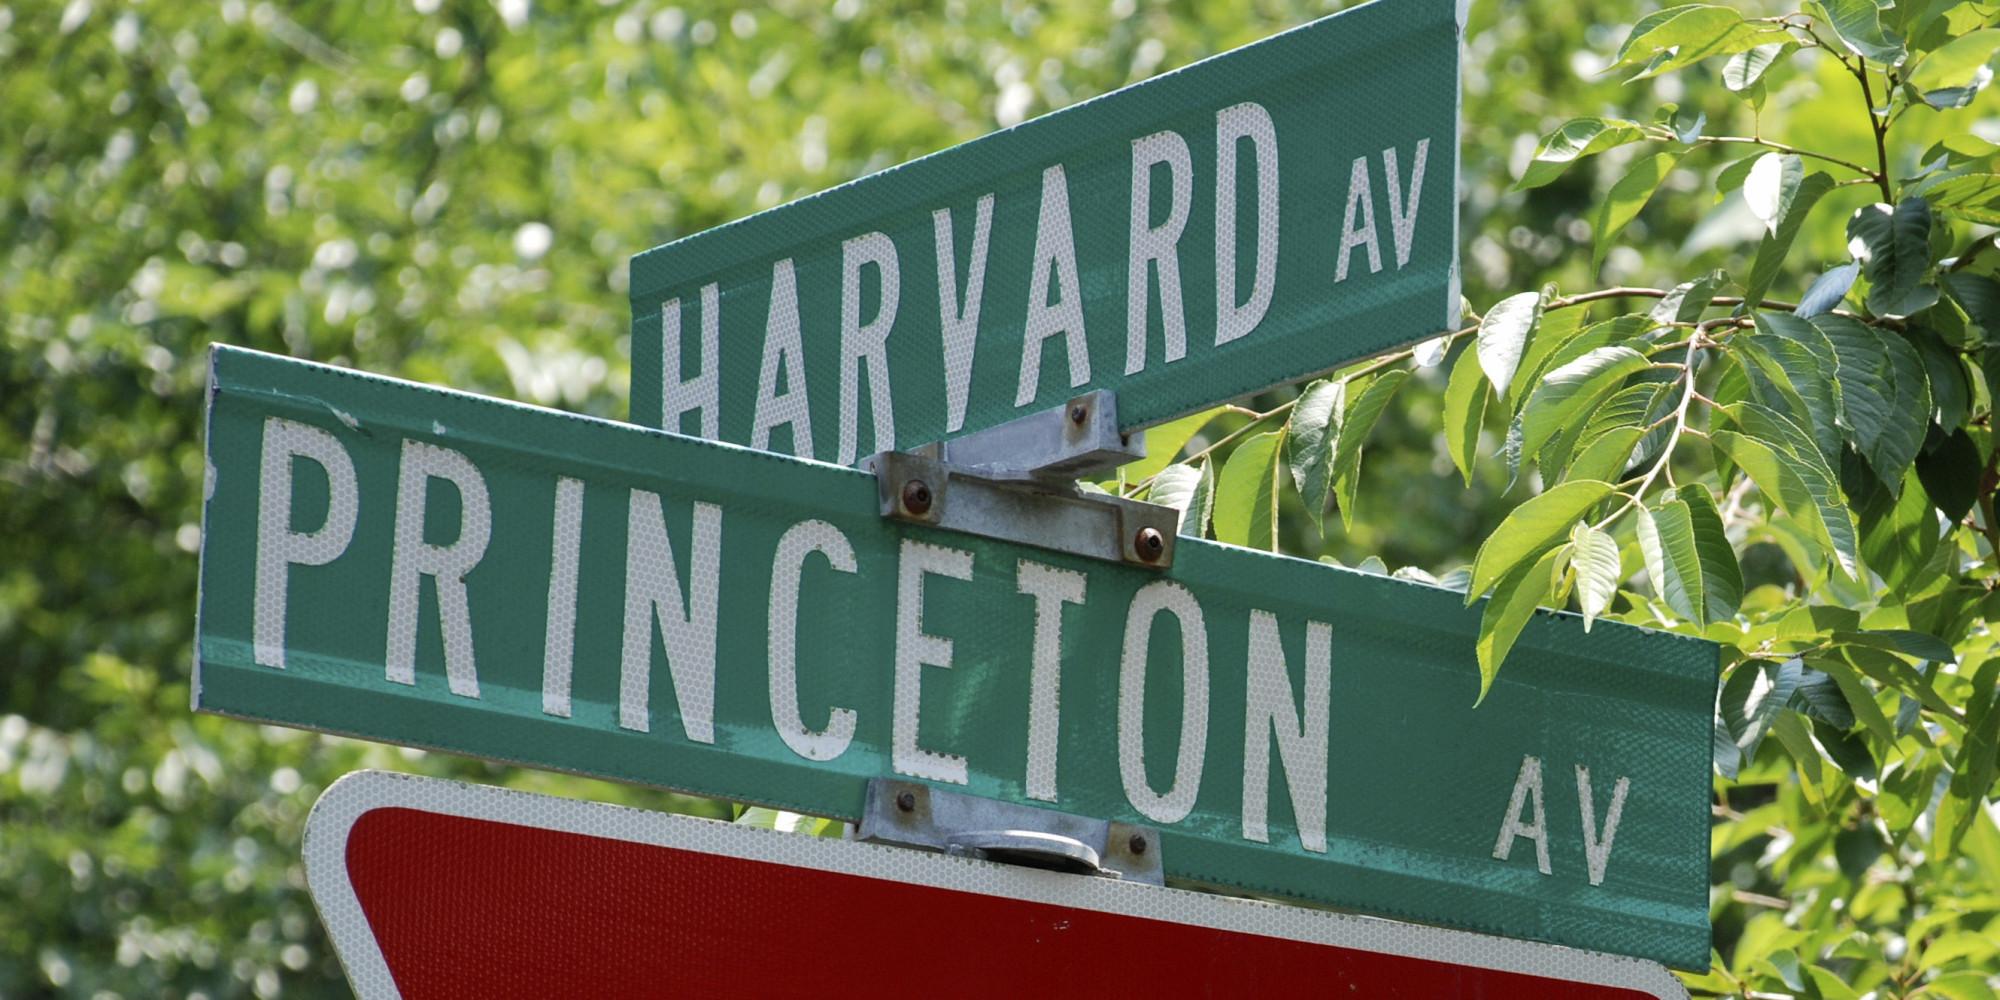 https://s-i.huffpost.com/gen/1378247/images/o-HARVARD-PRINCETON-facebook.jpg